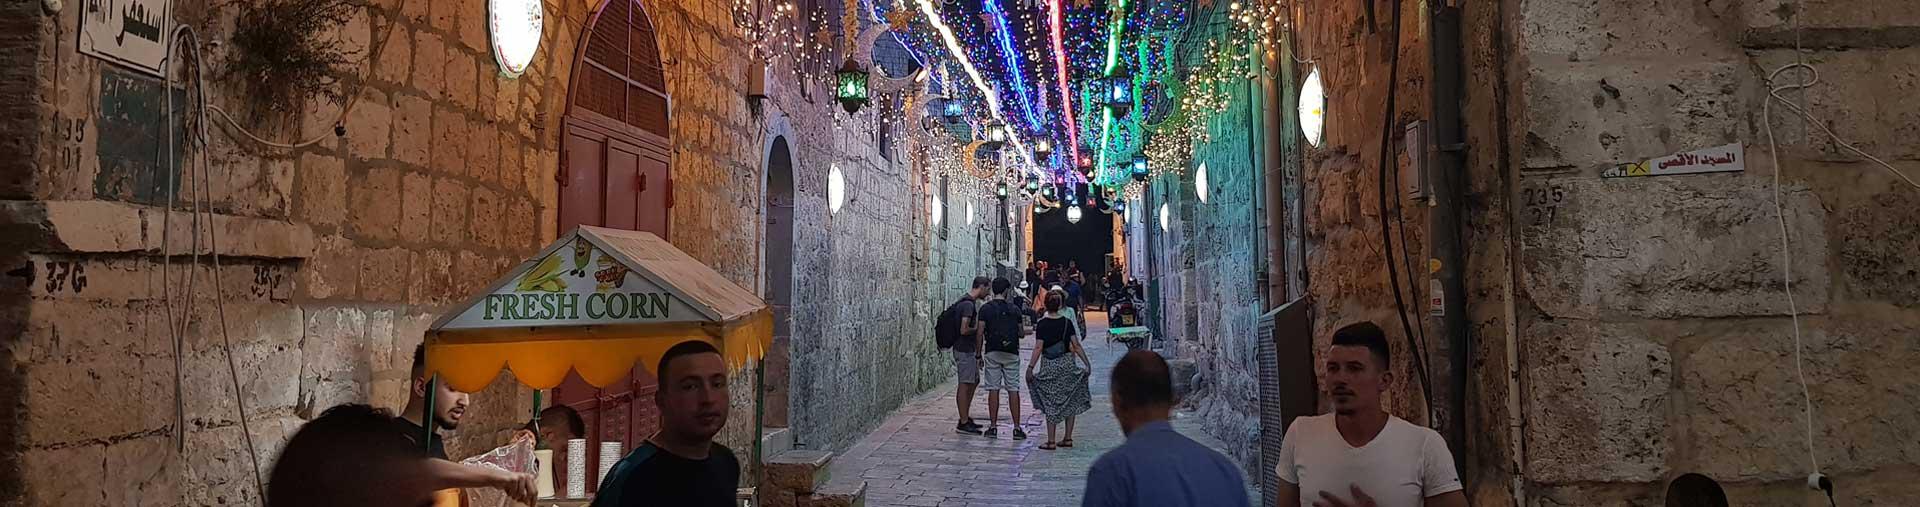 Muslim quarter at nigth